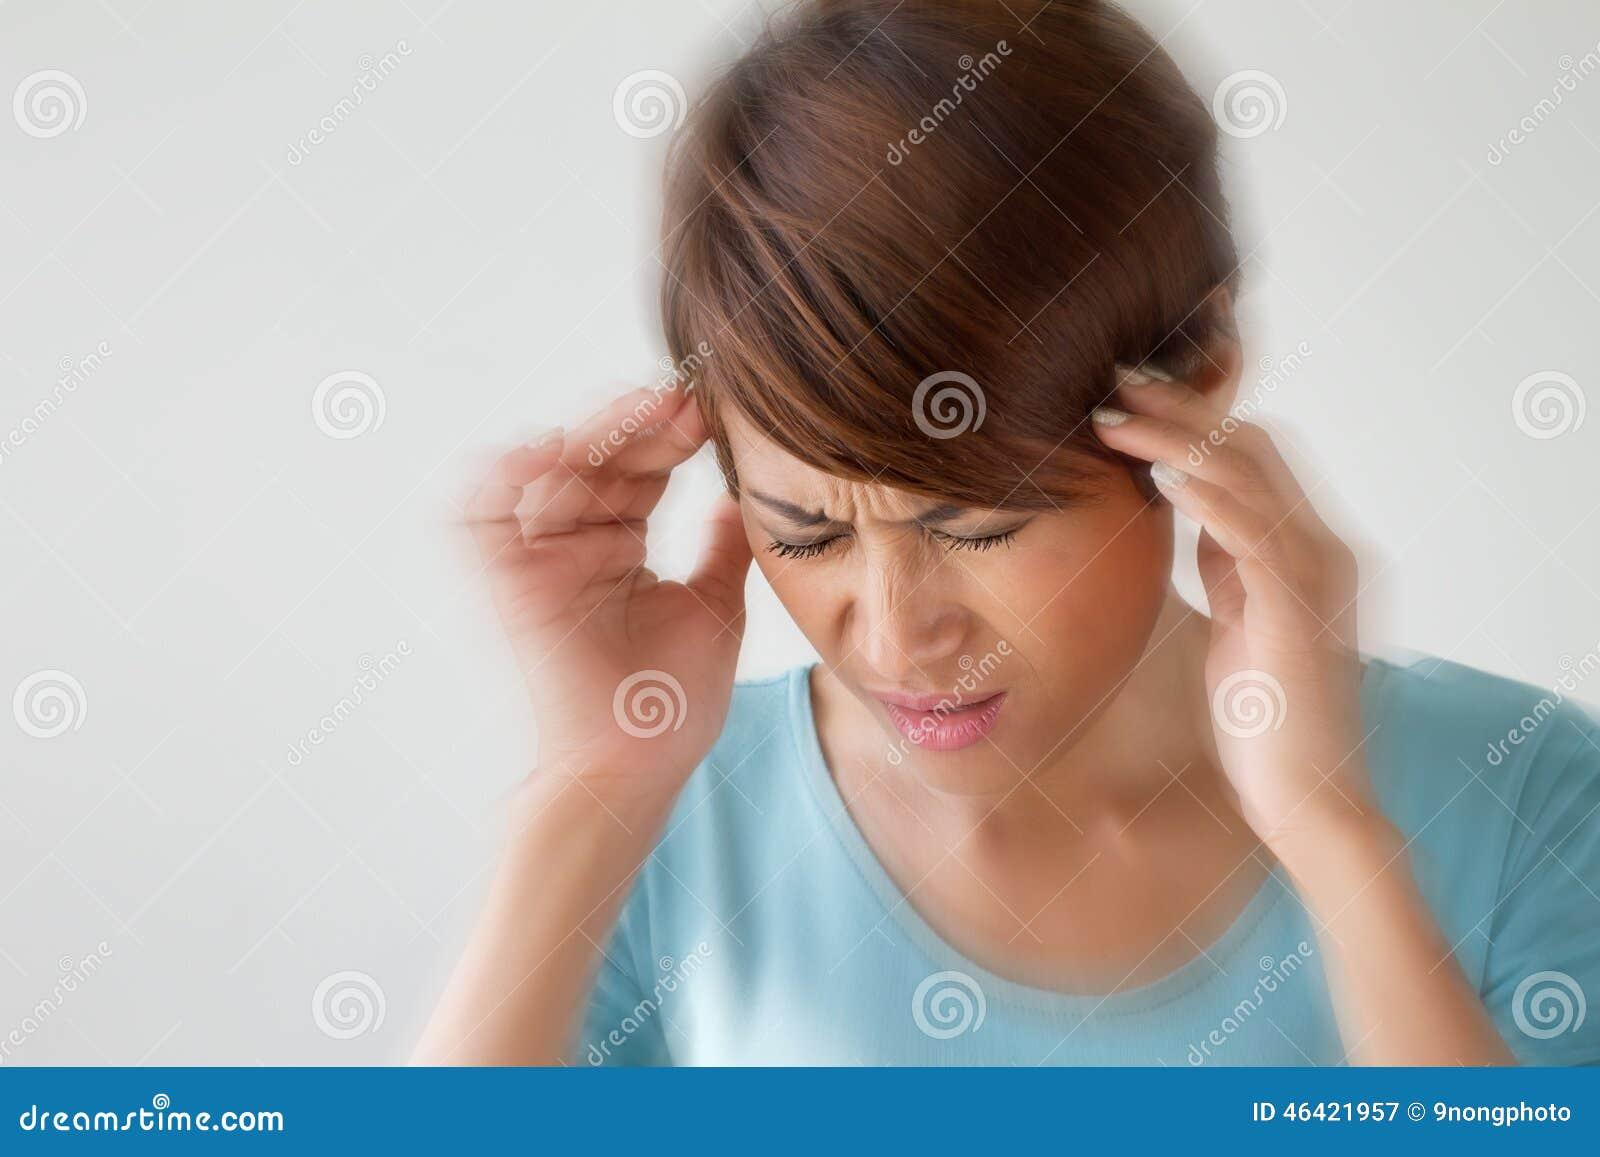 Woman suffers from pain, headache, sickness, migraine, stress